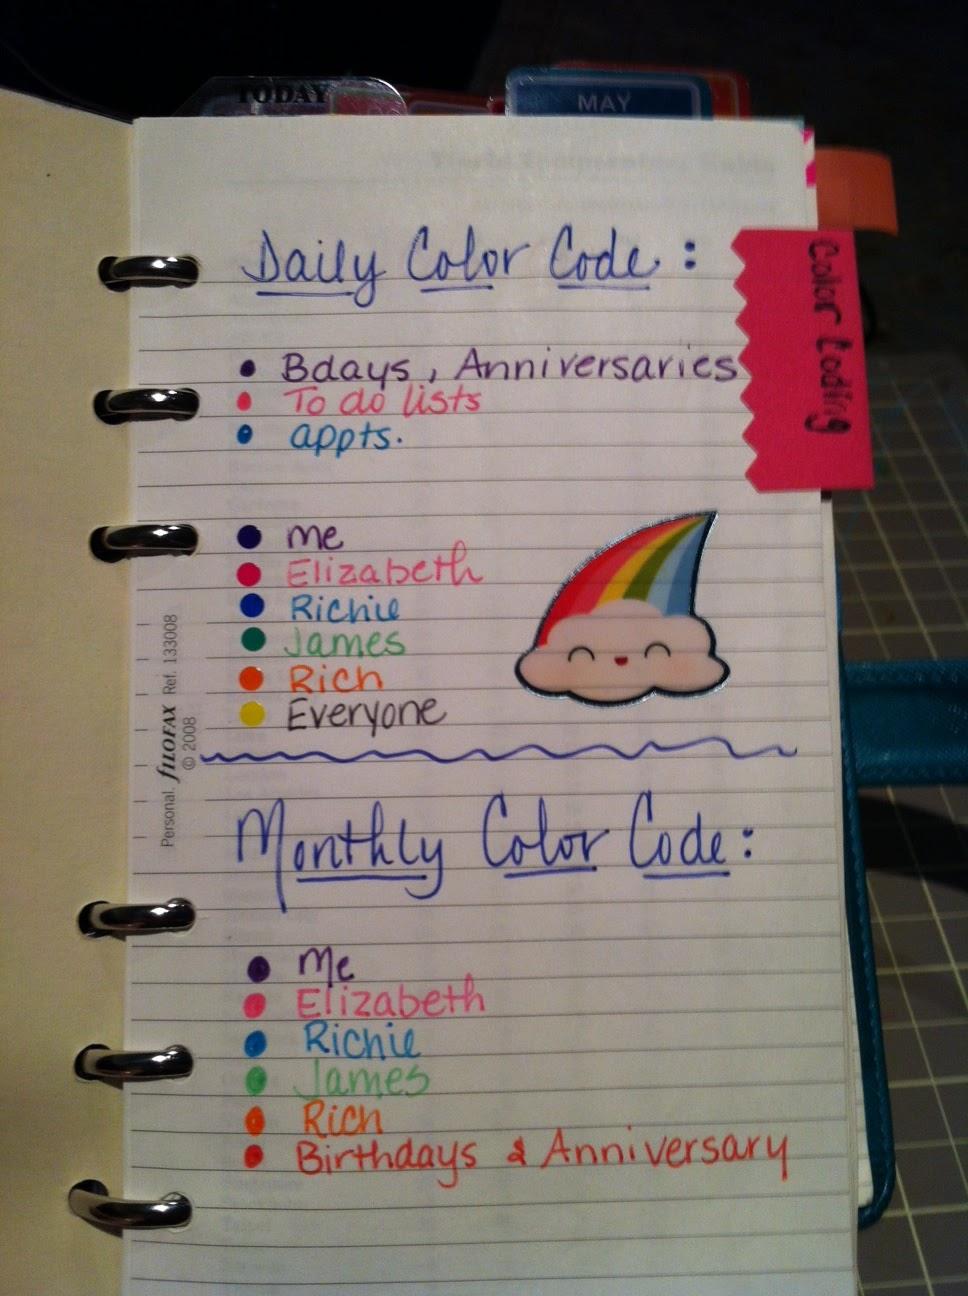 Team filofax my color coding system for my filofax for Color coding planner